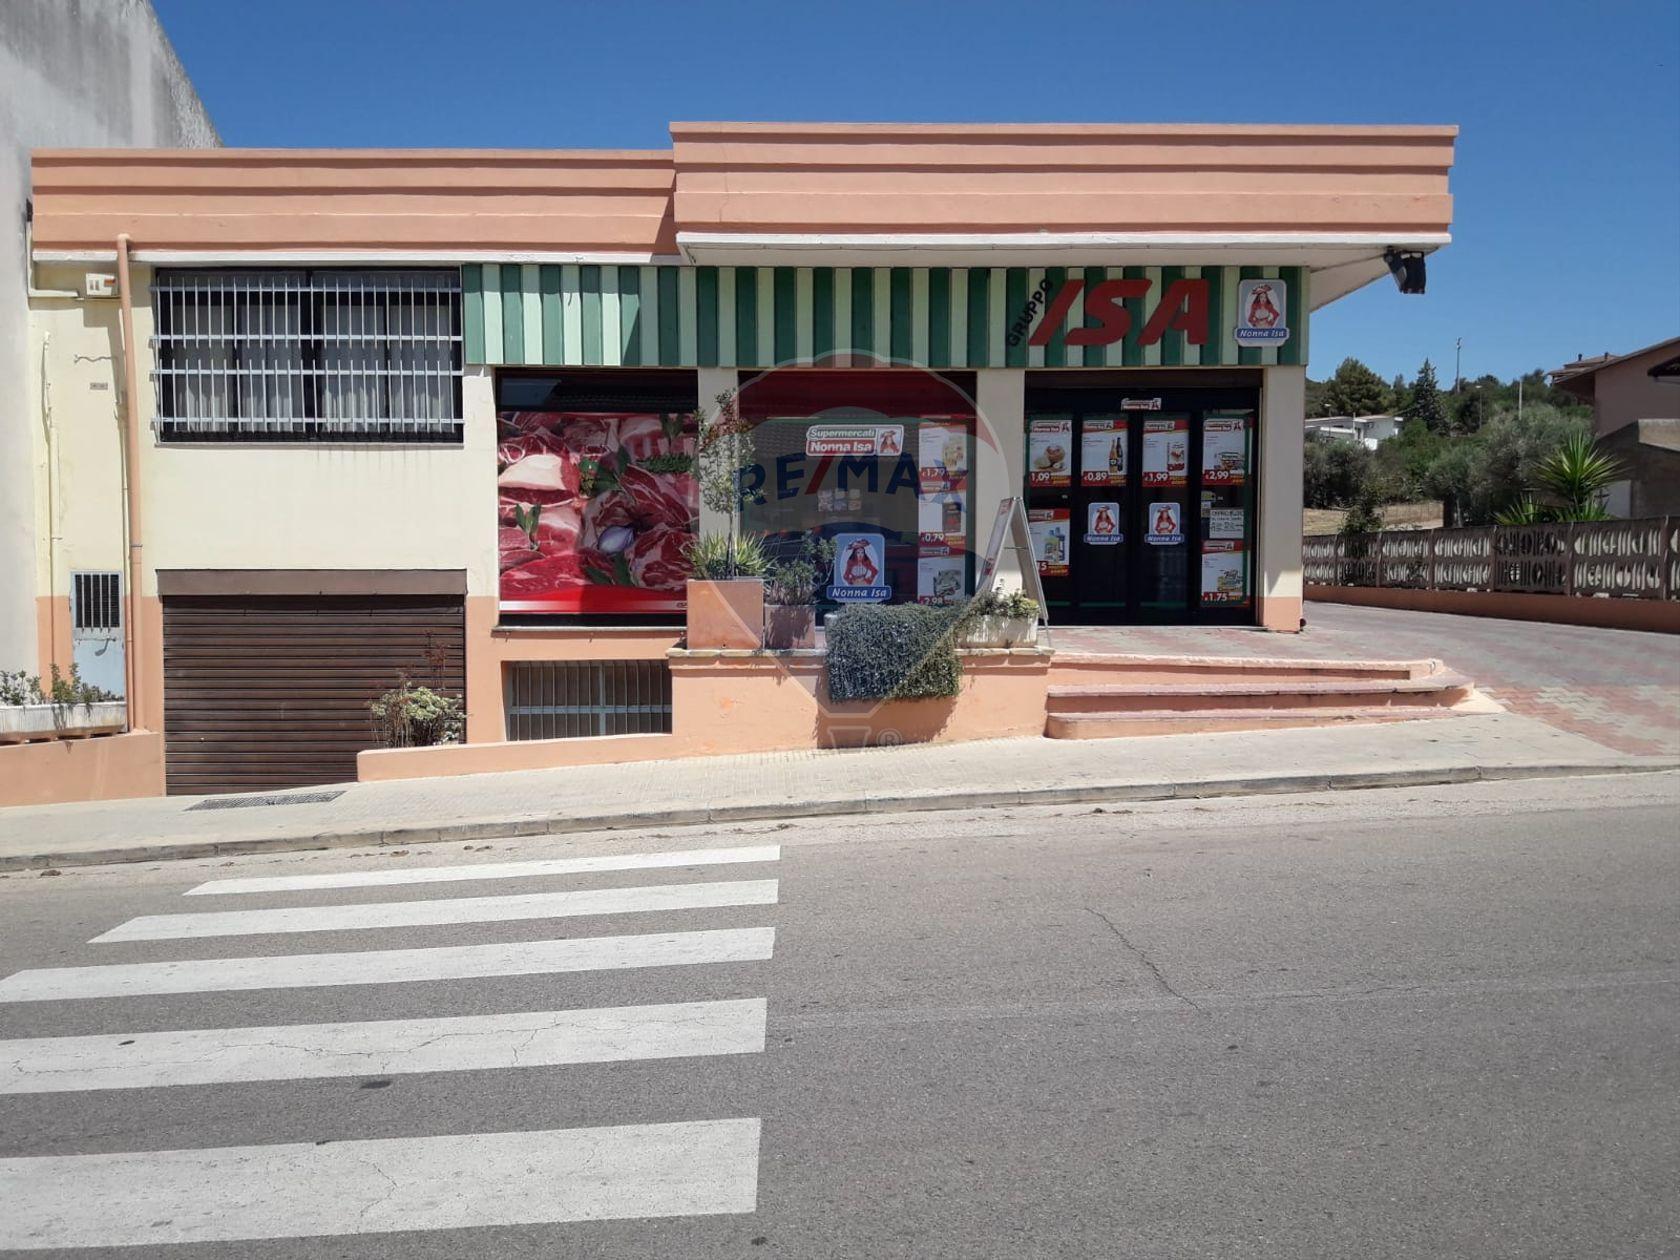 Negozio Riomurtas, Narcao, CI Vendita